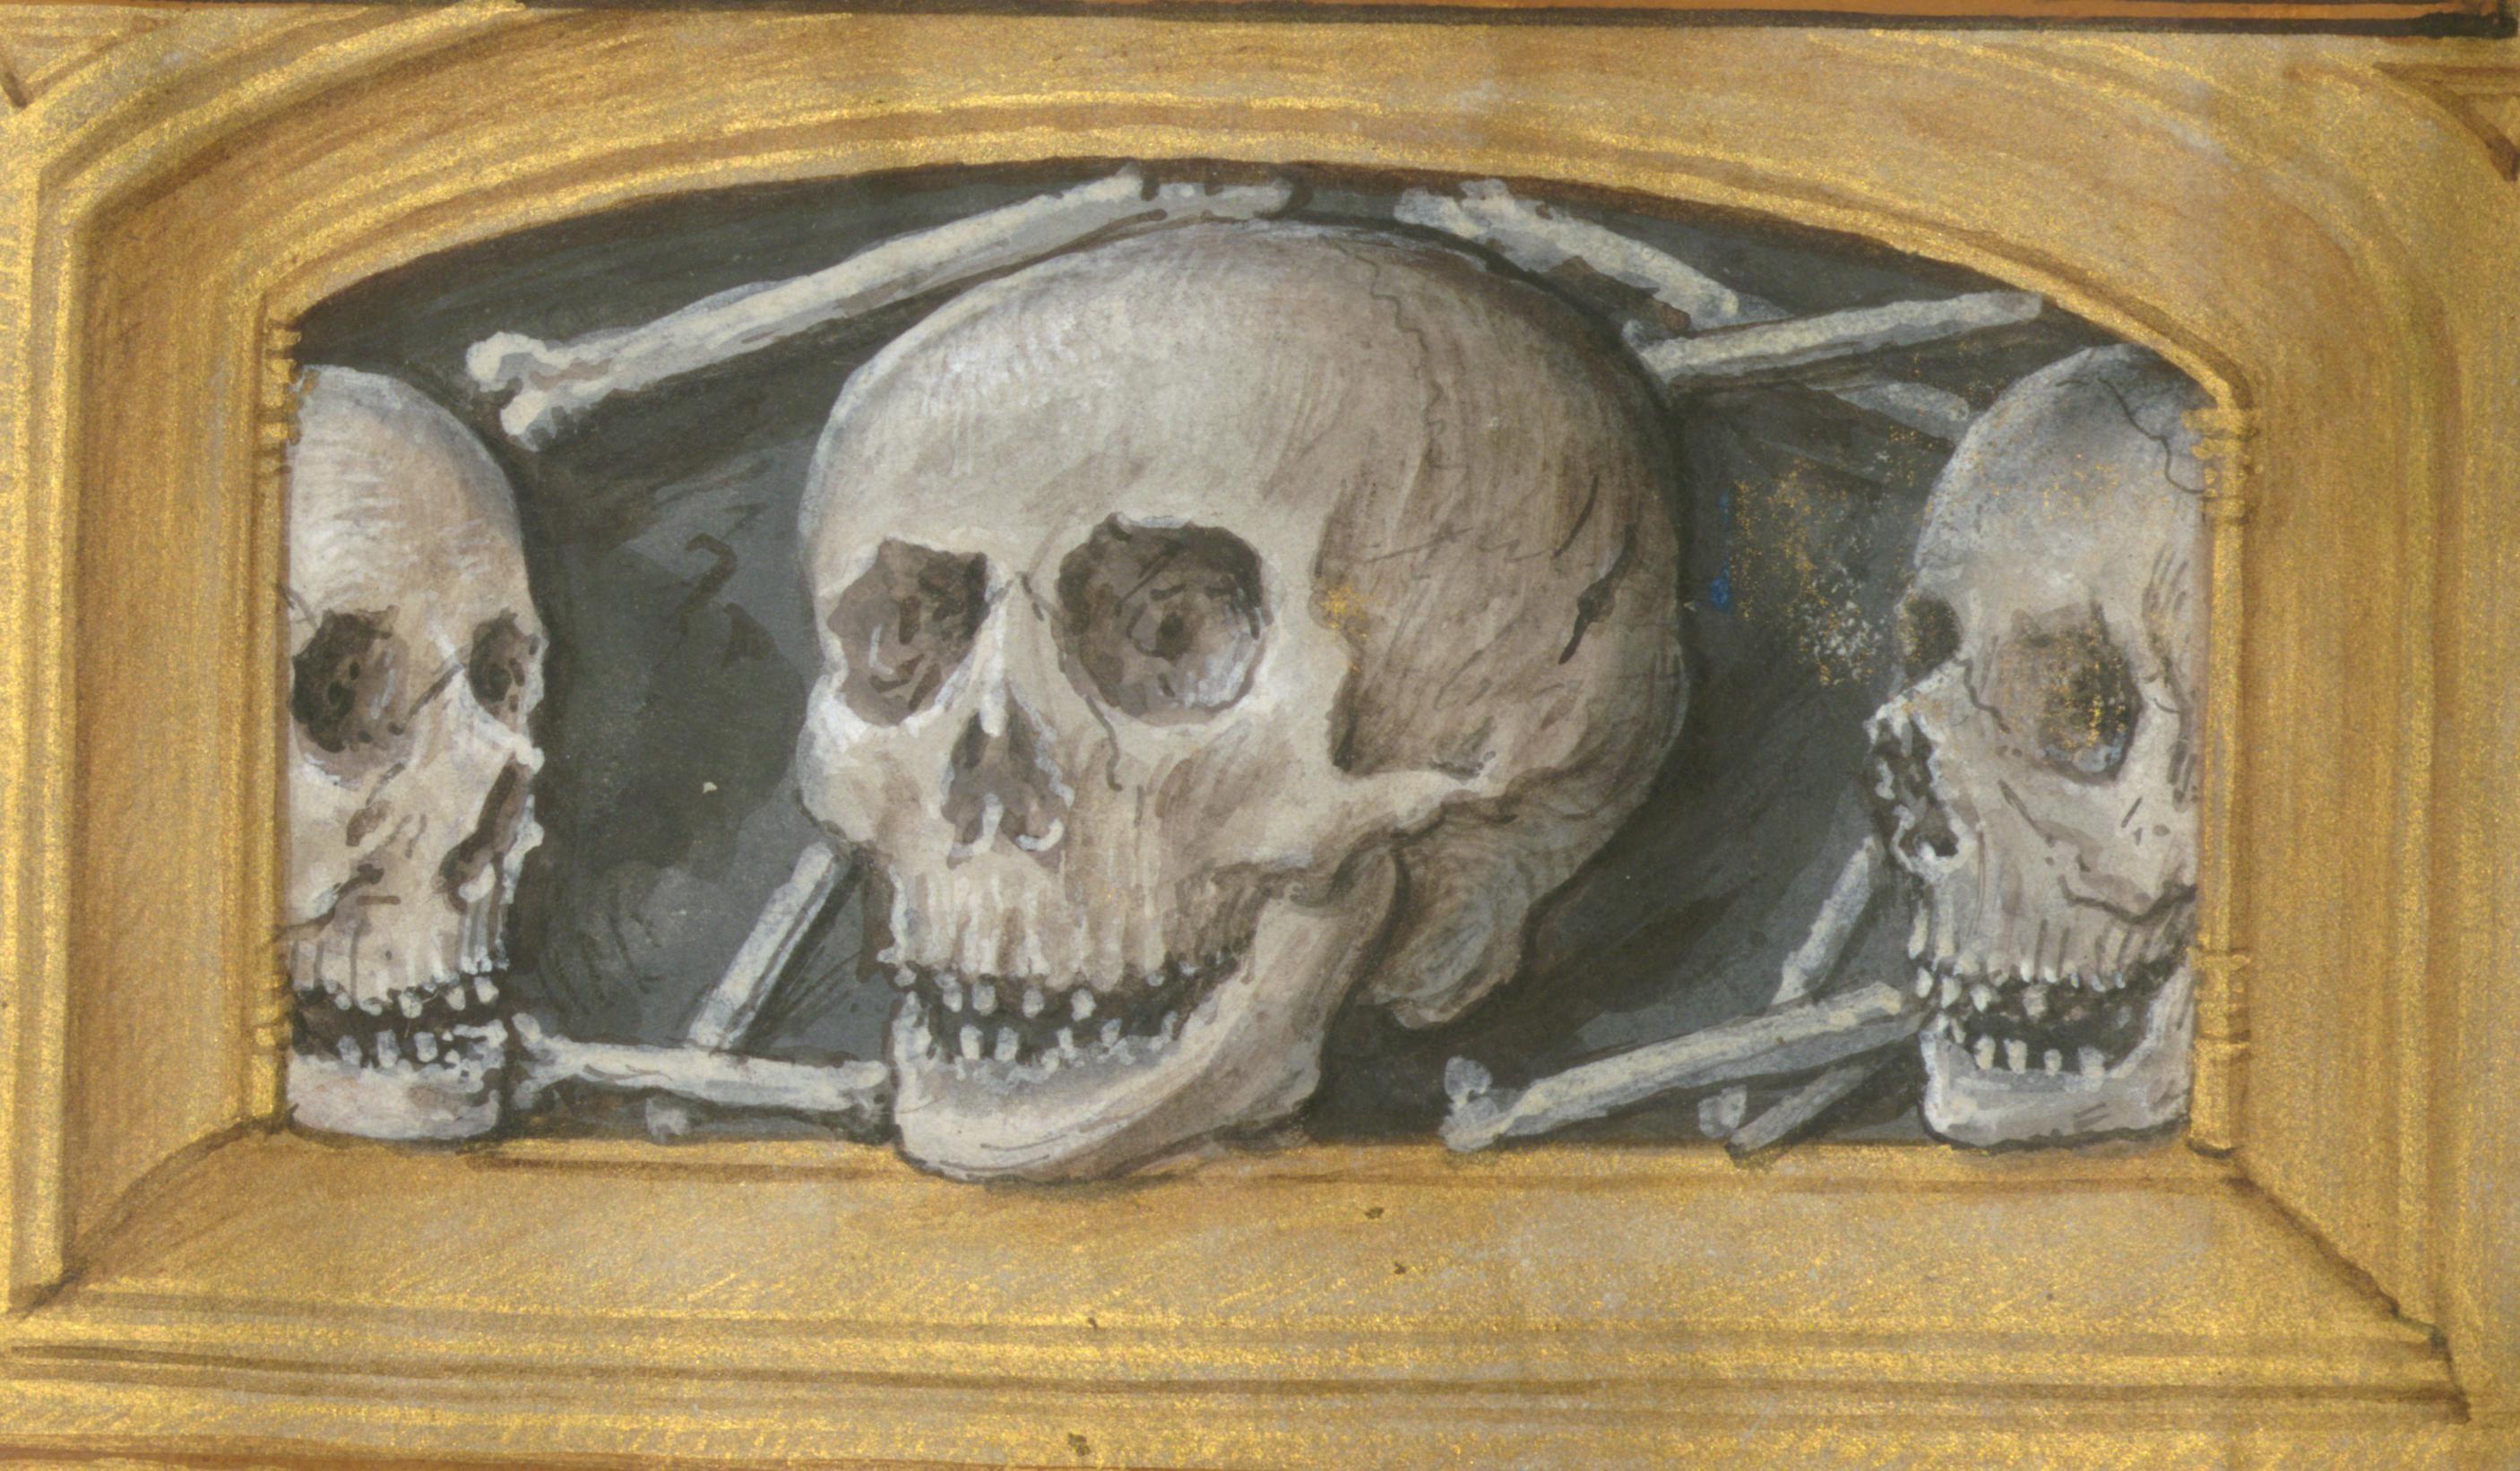 Aussem Hours, Walters Manuscript W.437, fol. 66v detail